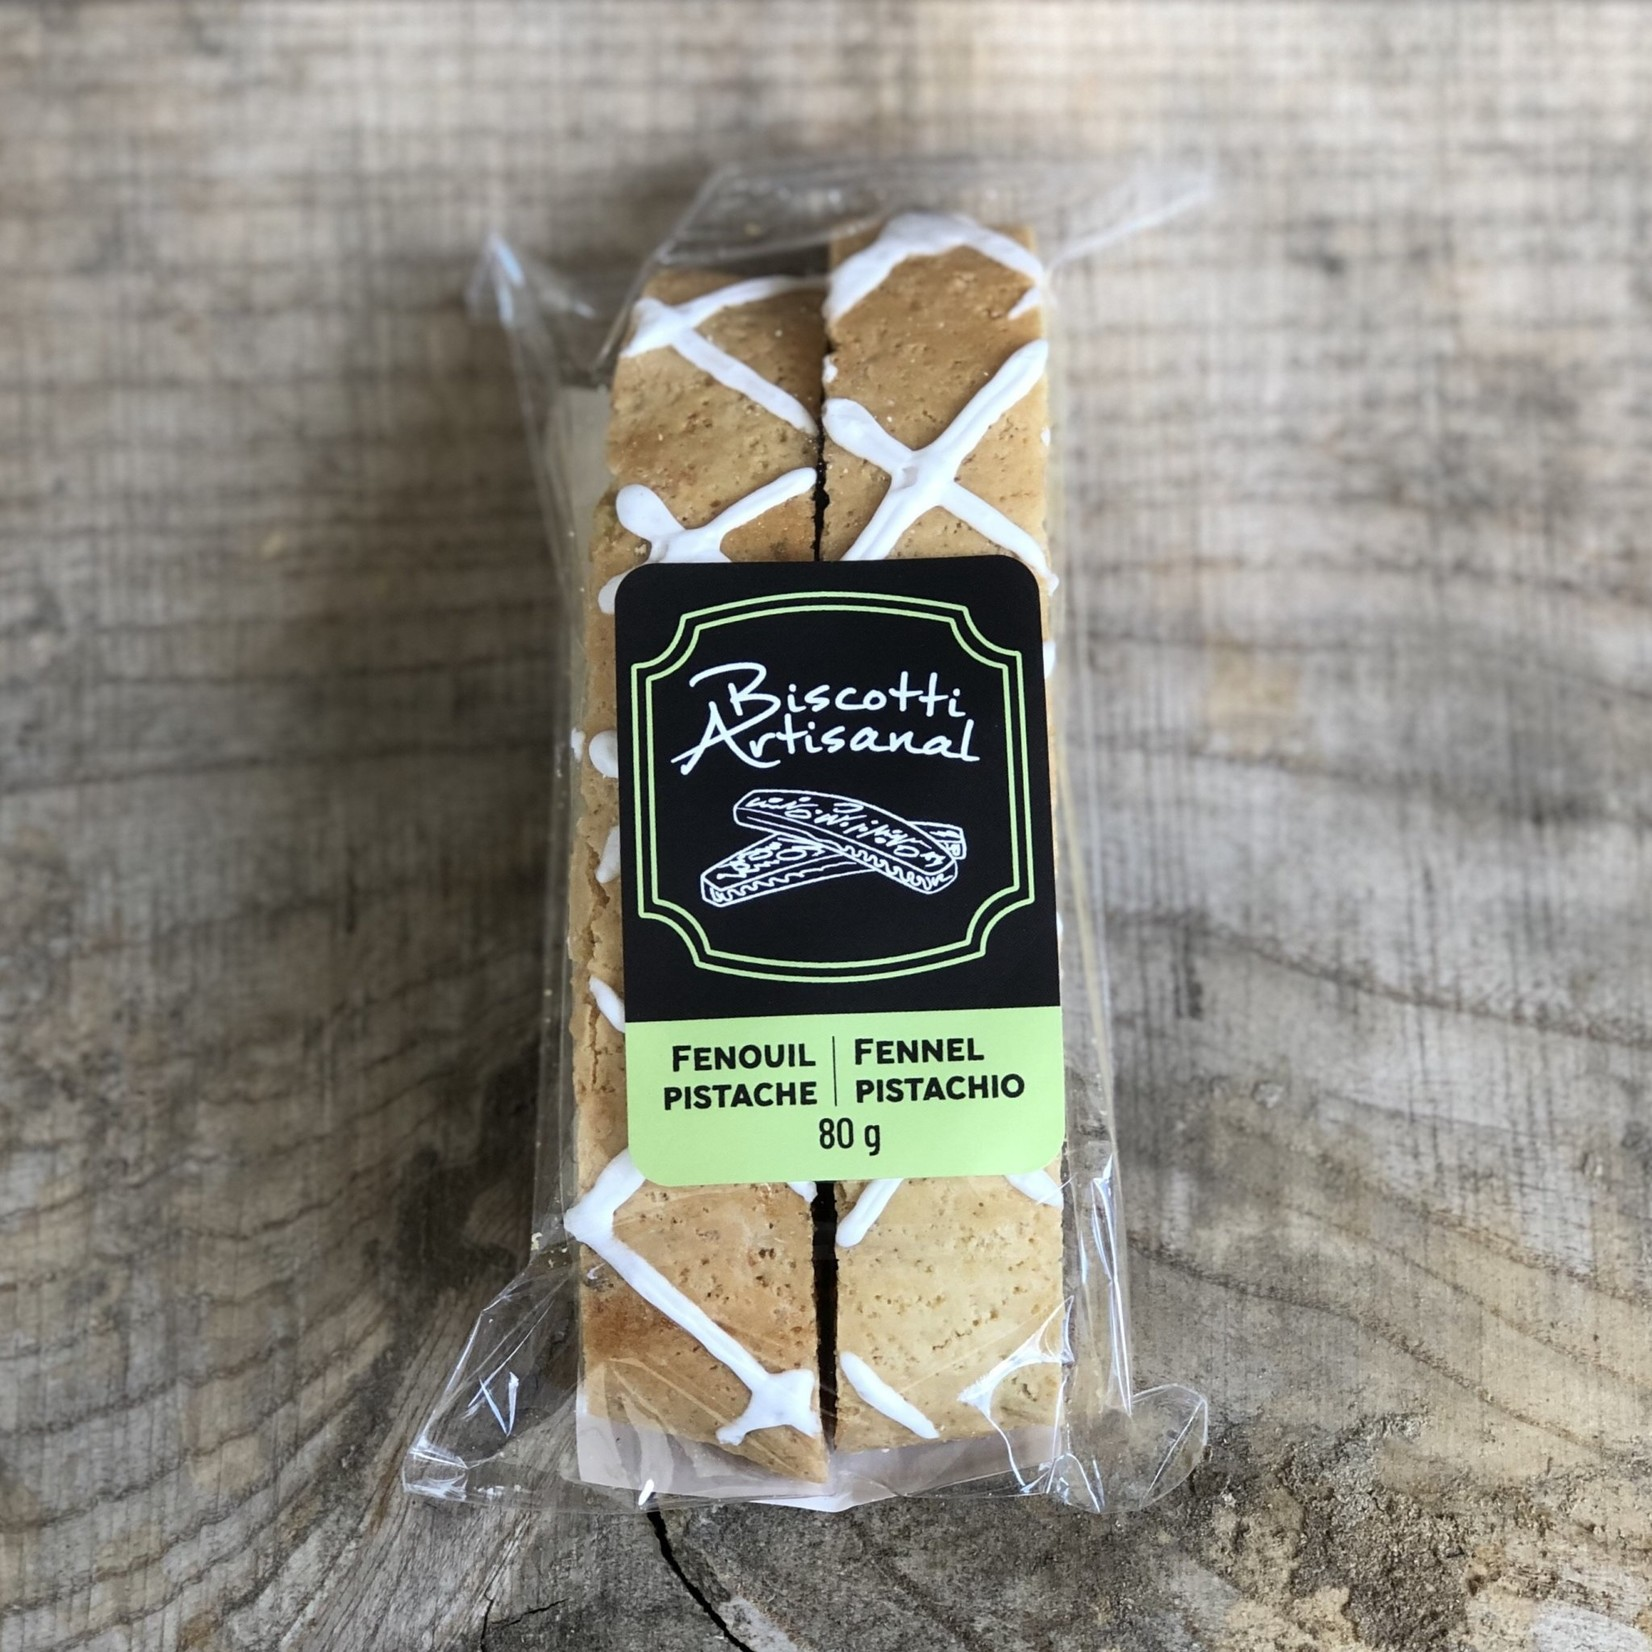 Biscotti Artisanal Fenouil Pistache